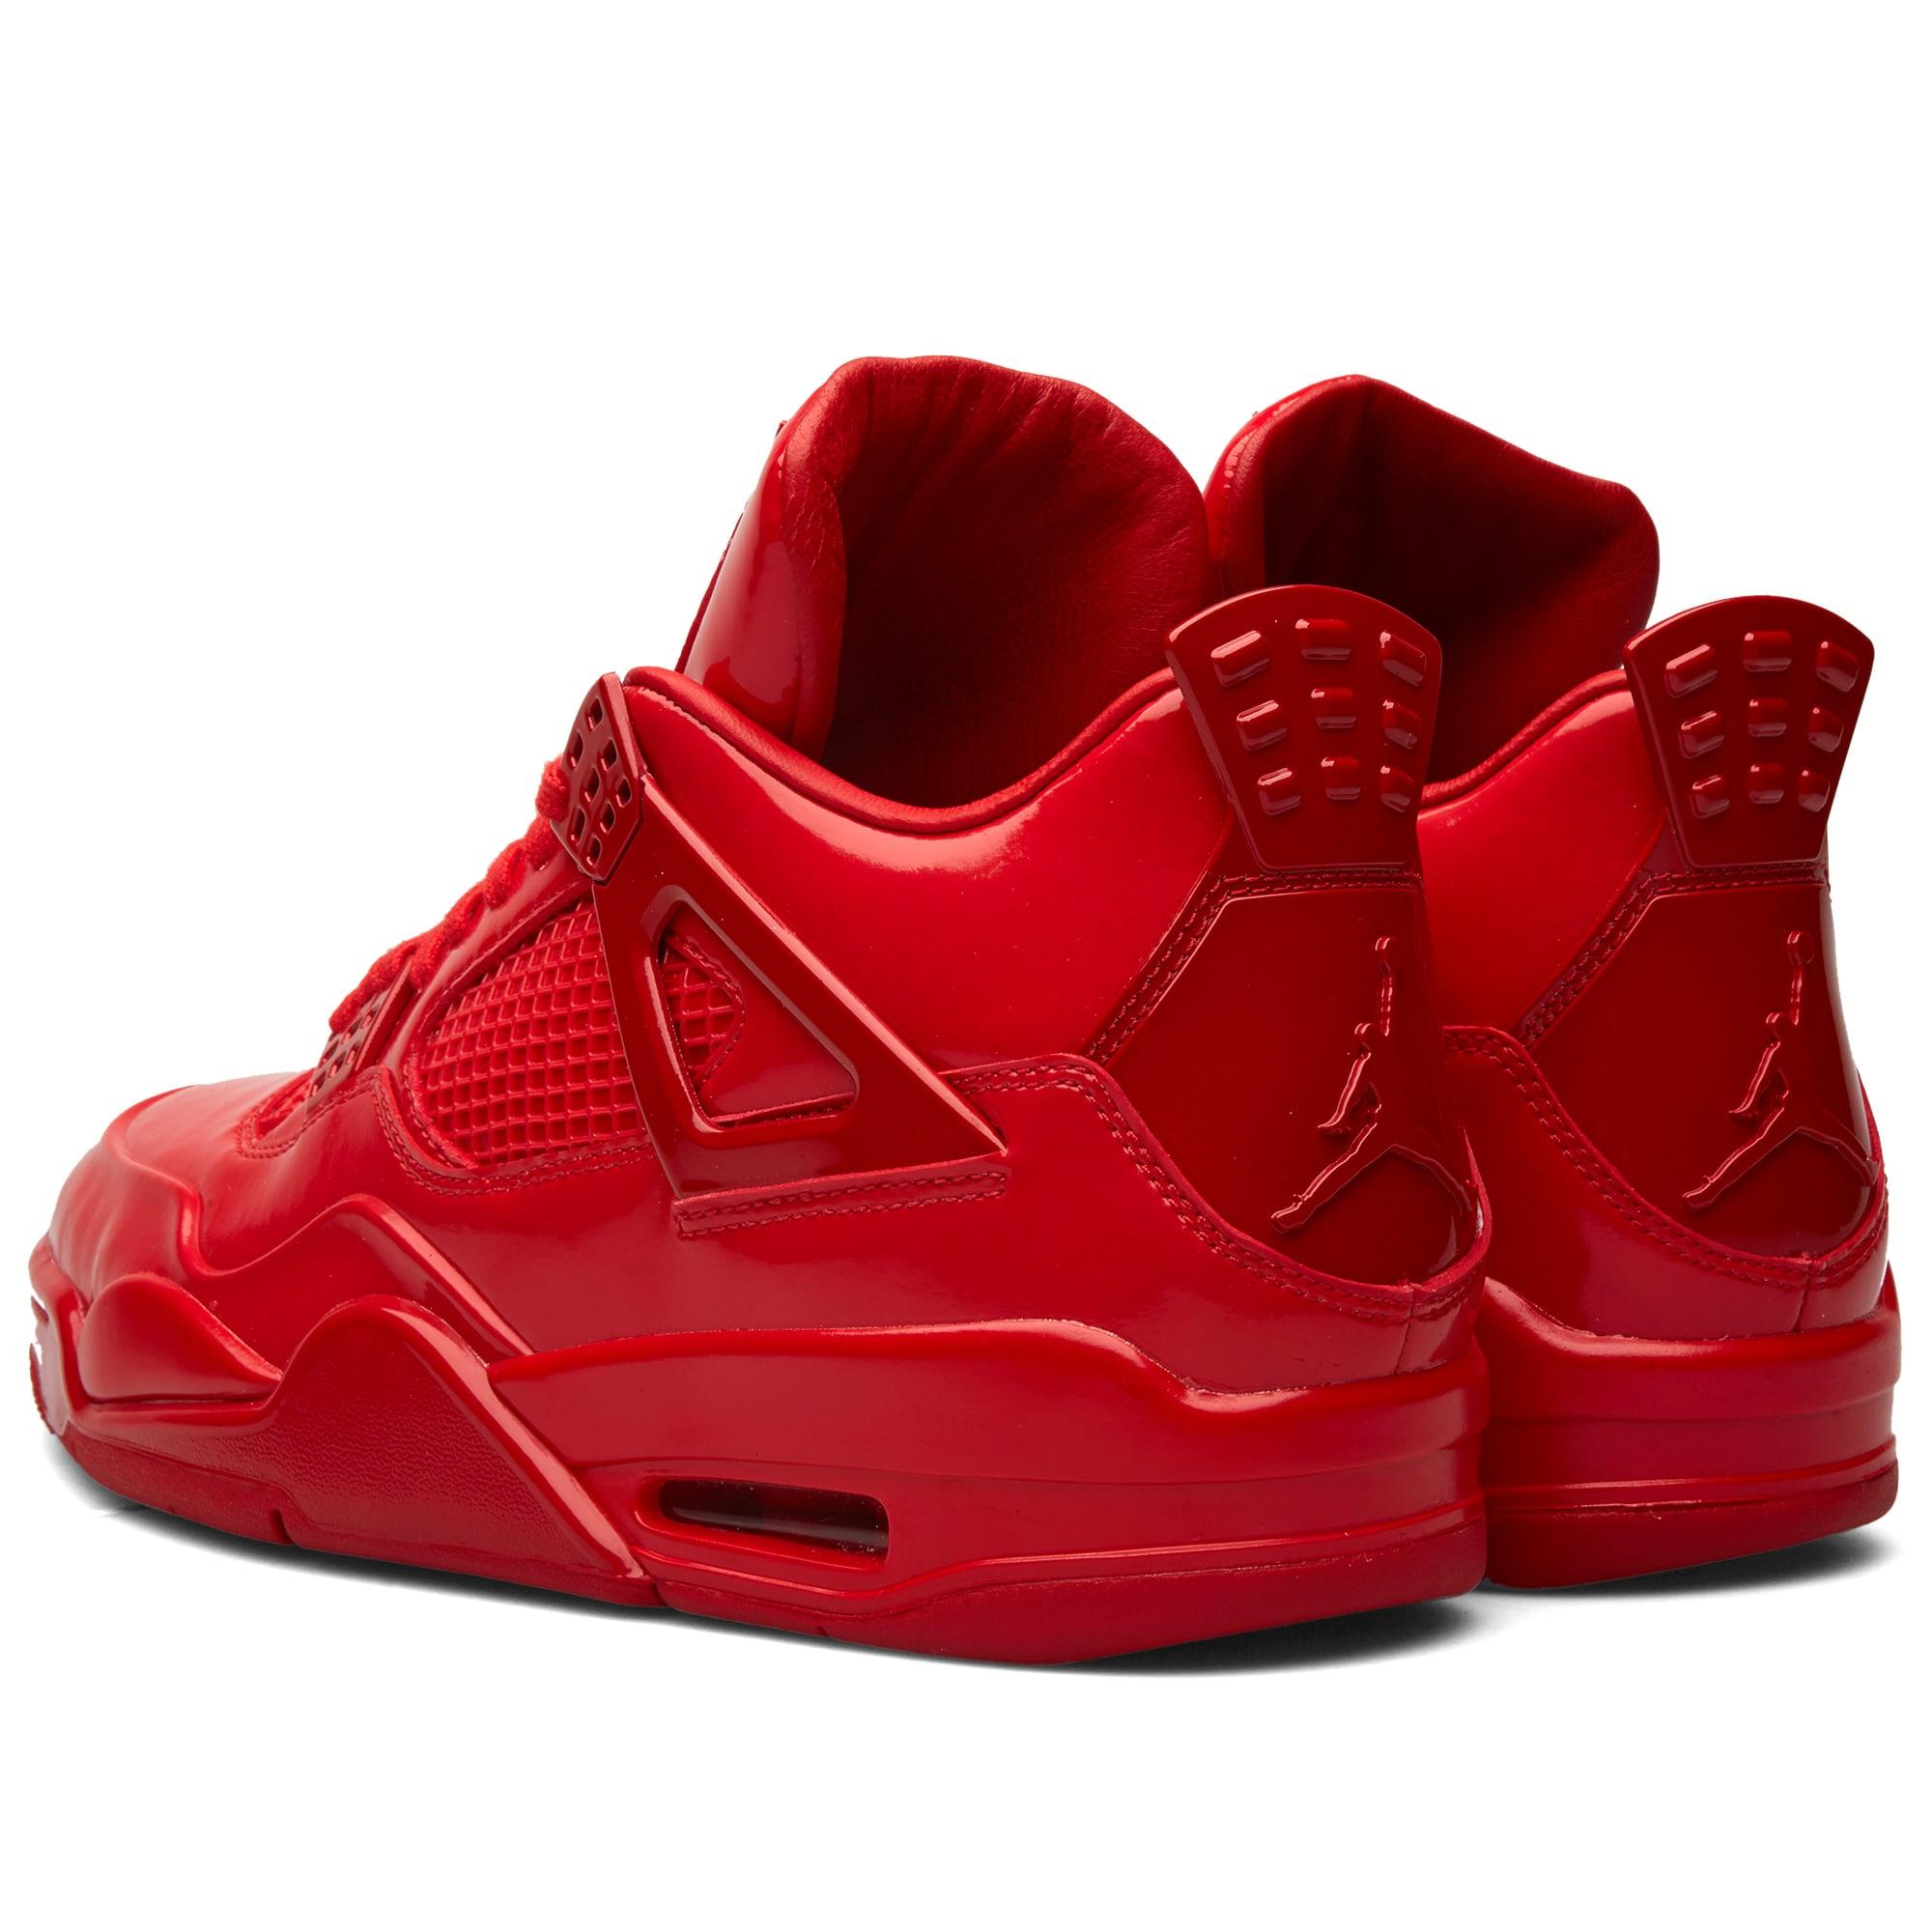 low priced 097a8 6191f Nike Air Jordan XI Lab4 University Red   END.